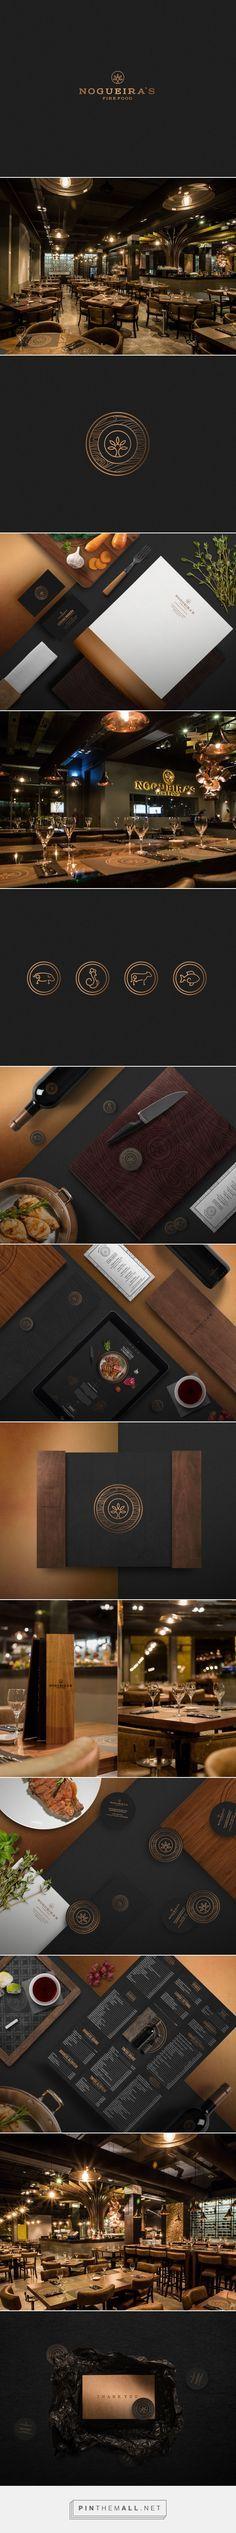 Nogueira's Fire Food Restaurant Branding by Bullseye    Fivestar Branding Agency – Design and Branding Agency & Curated Inspiration Gallery